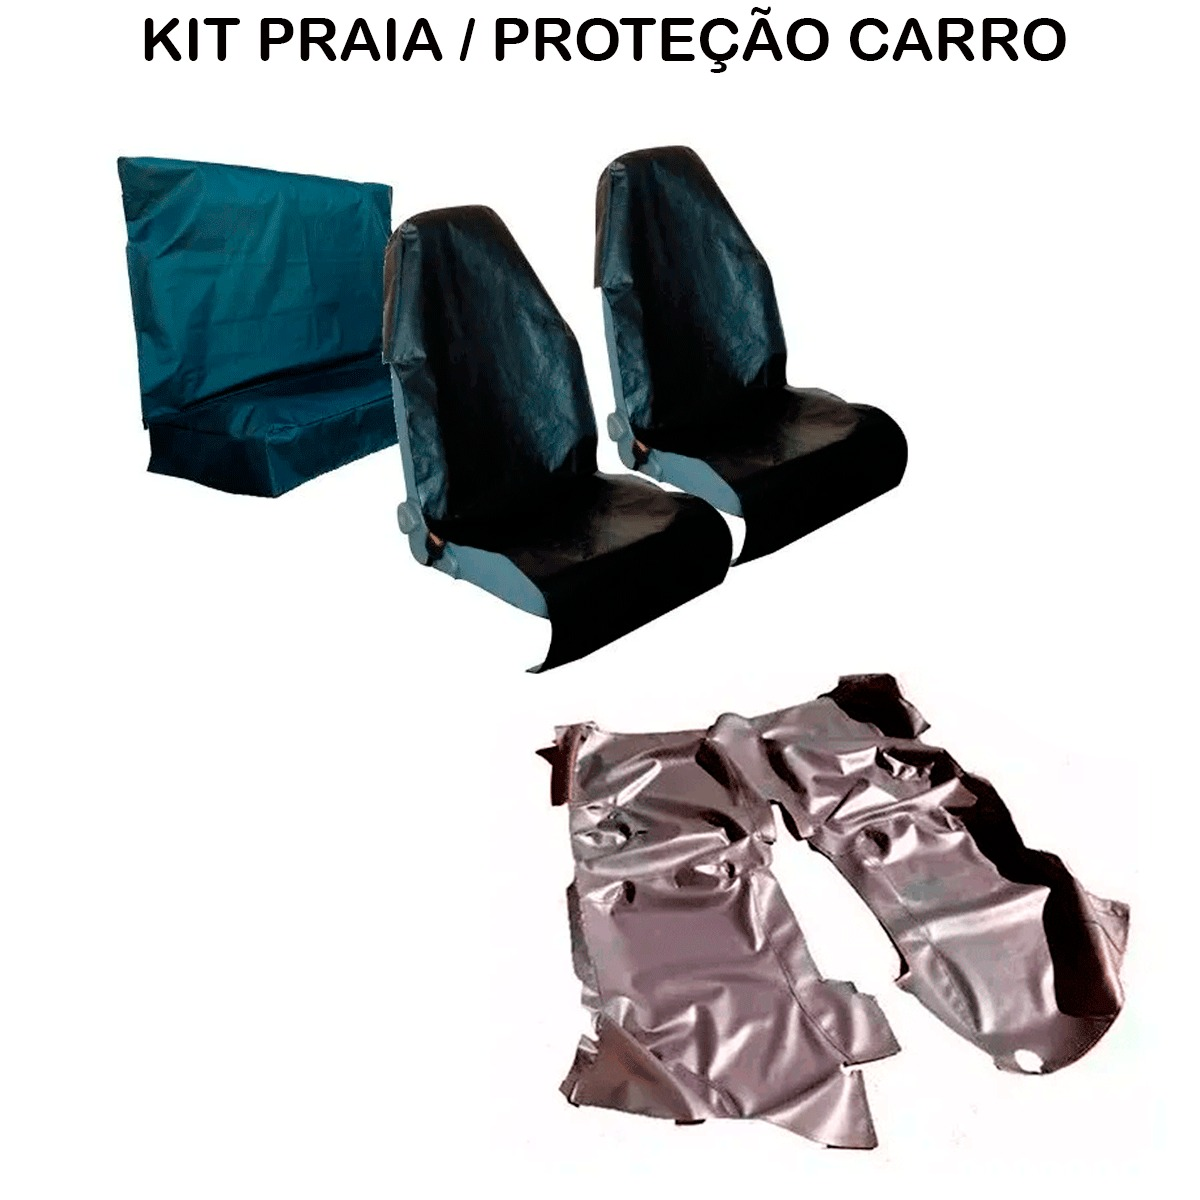 Tapete Em Vinil Chevrolet Caravan + Capa Banco Protecao Banco Areia Suor Academia